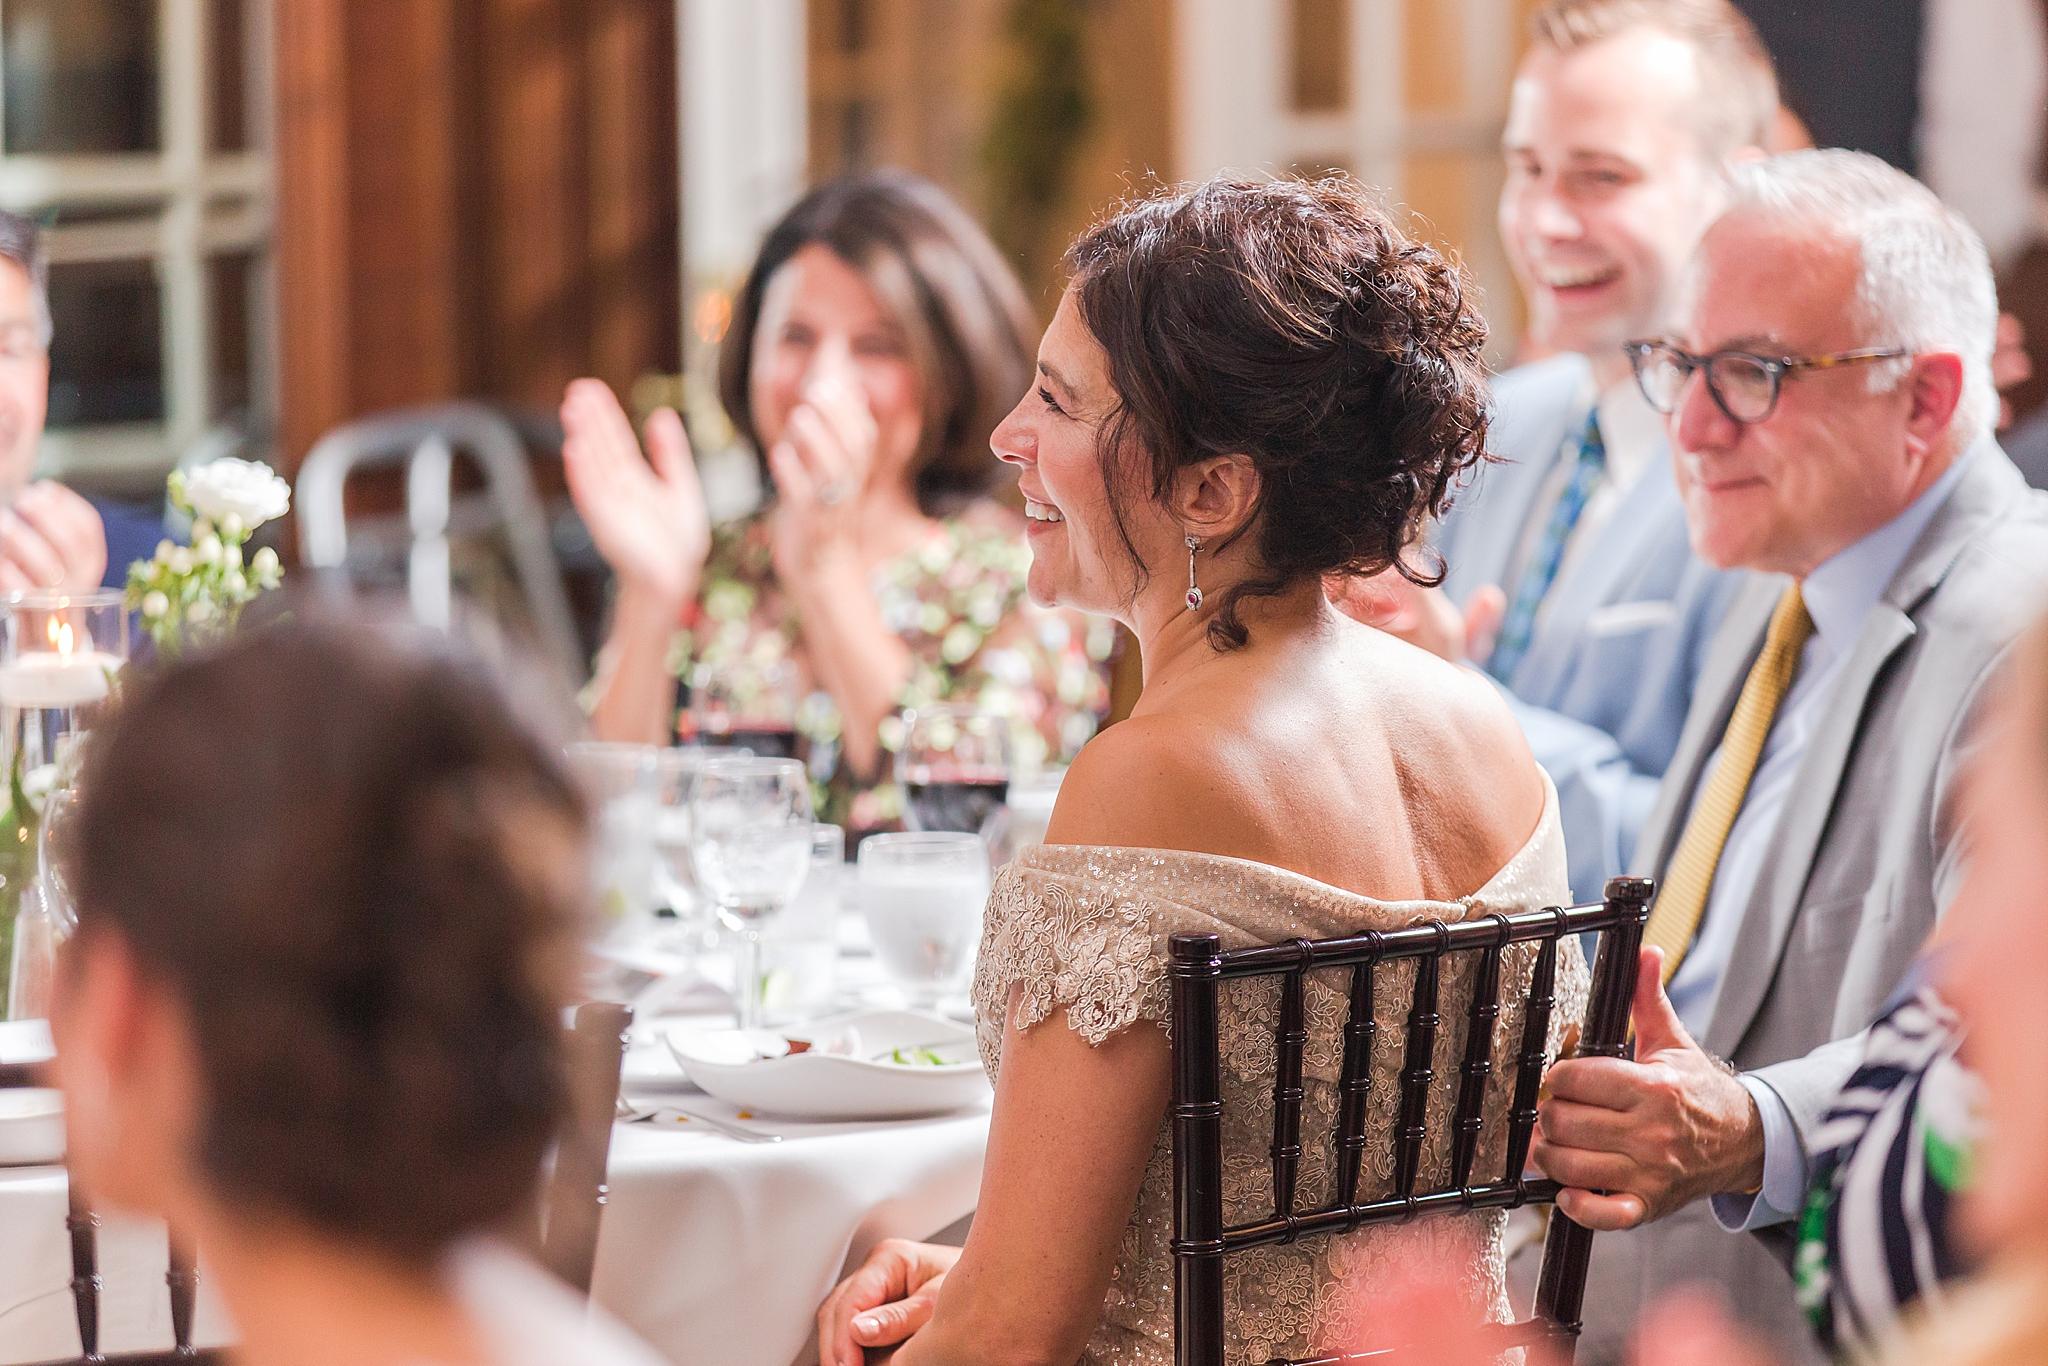 detroit-wedding-photographer-grosse-pointe-academy-chapel-detroit-golf-club-wedding-carly-matt-by-courtney-carolyn-photography_0097.jpg